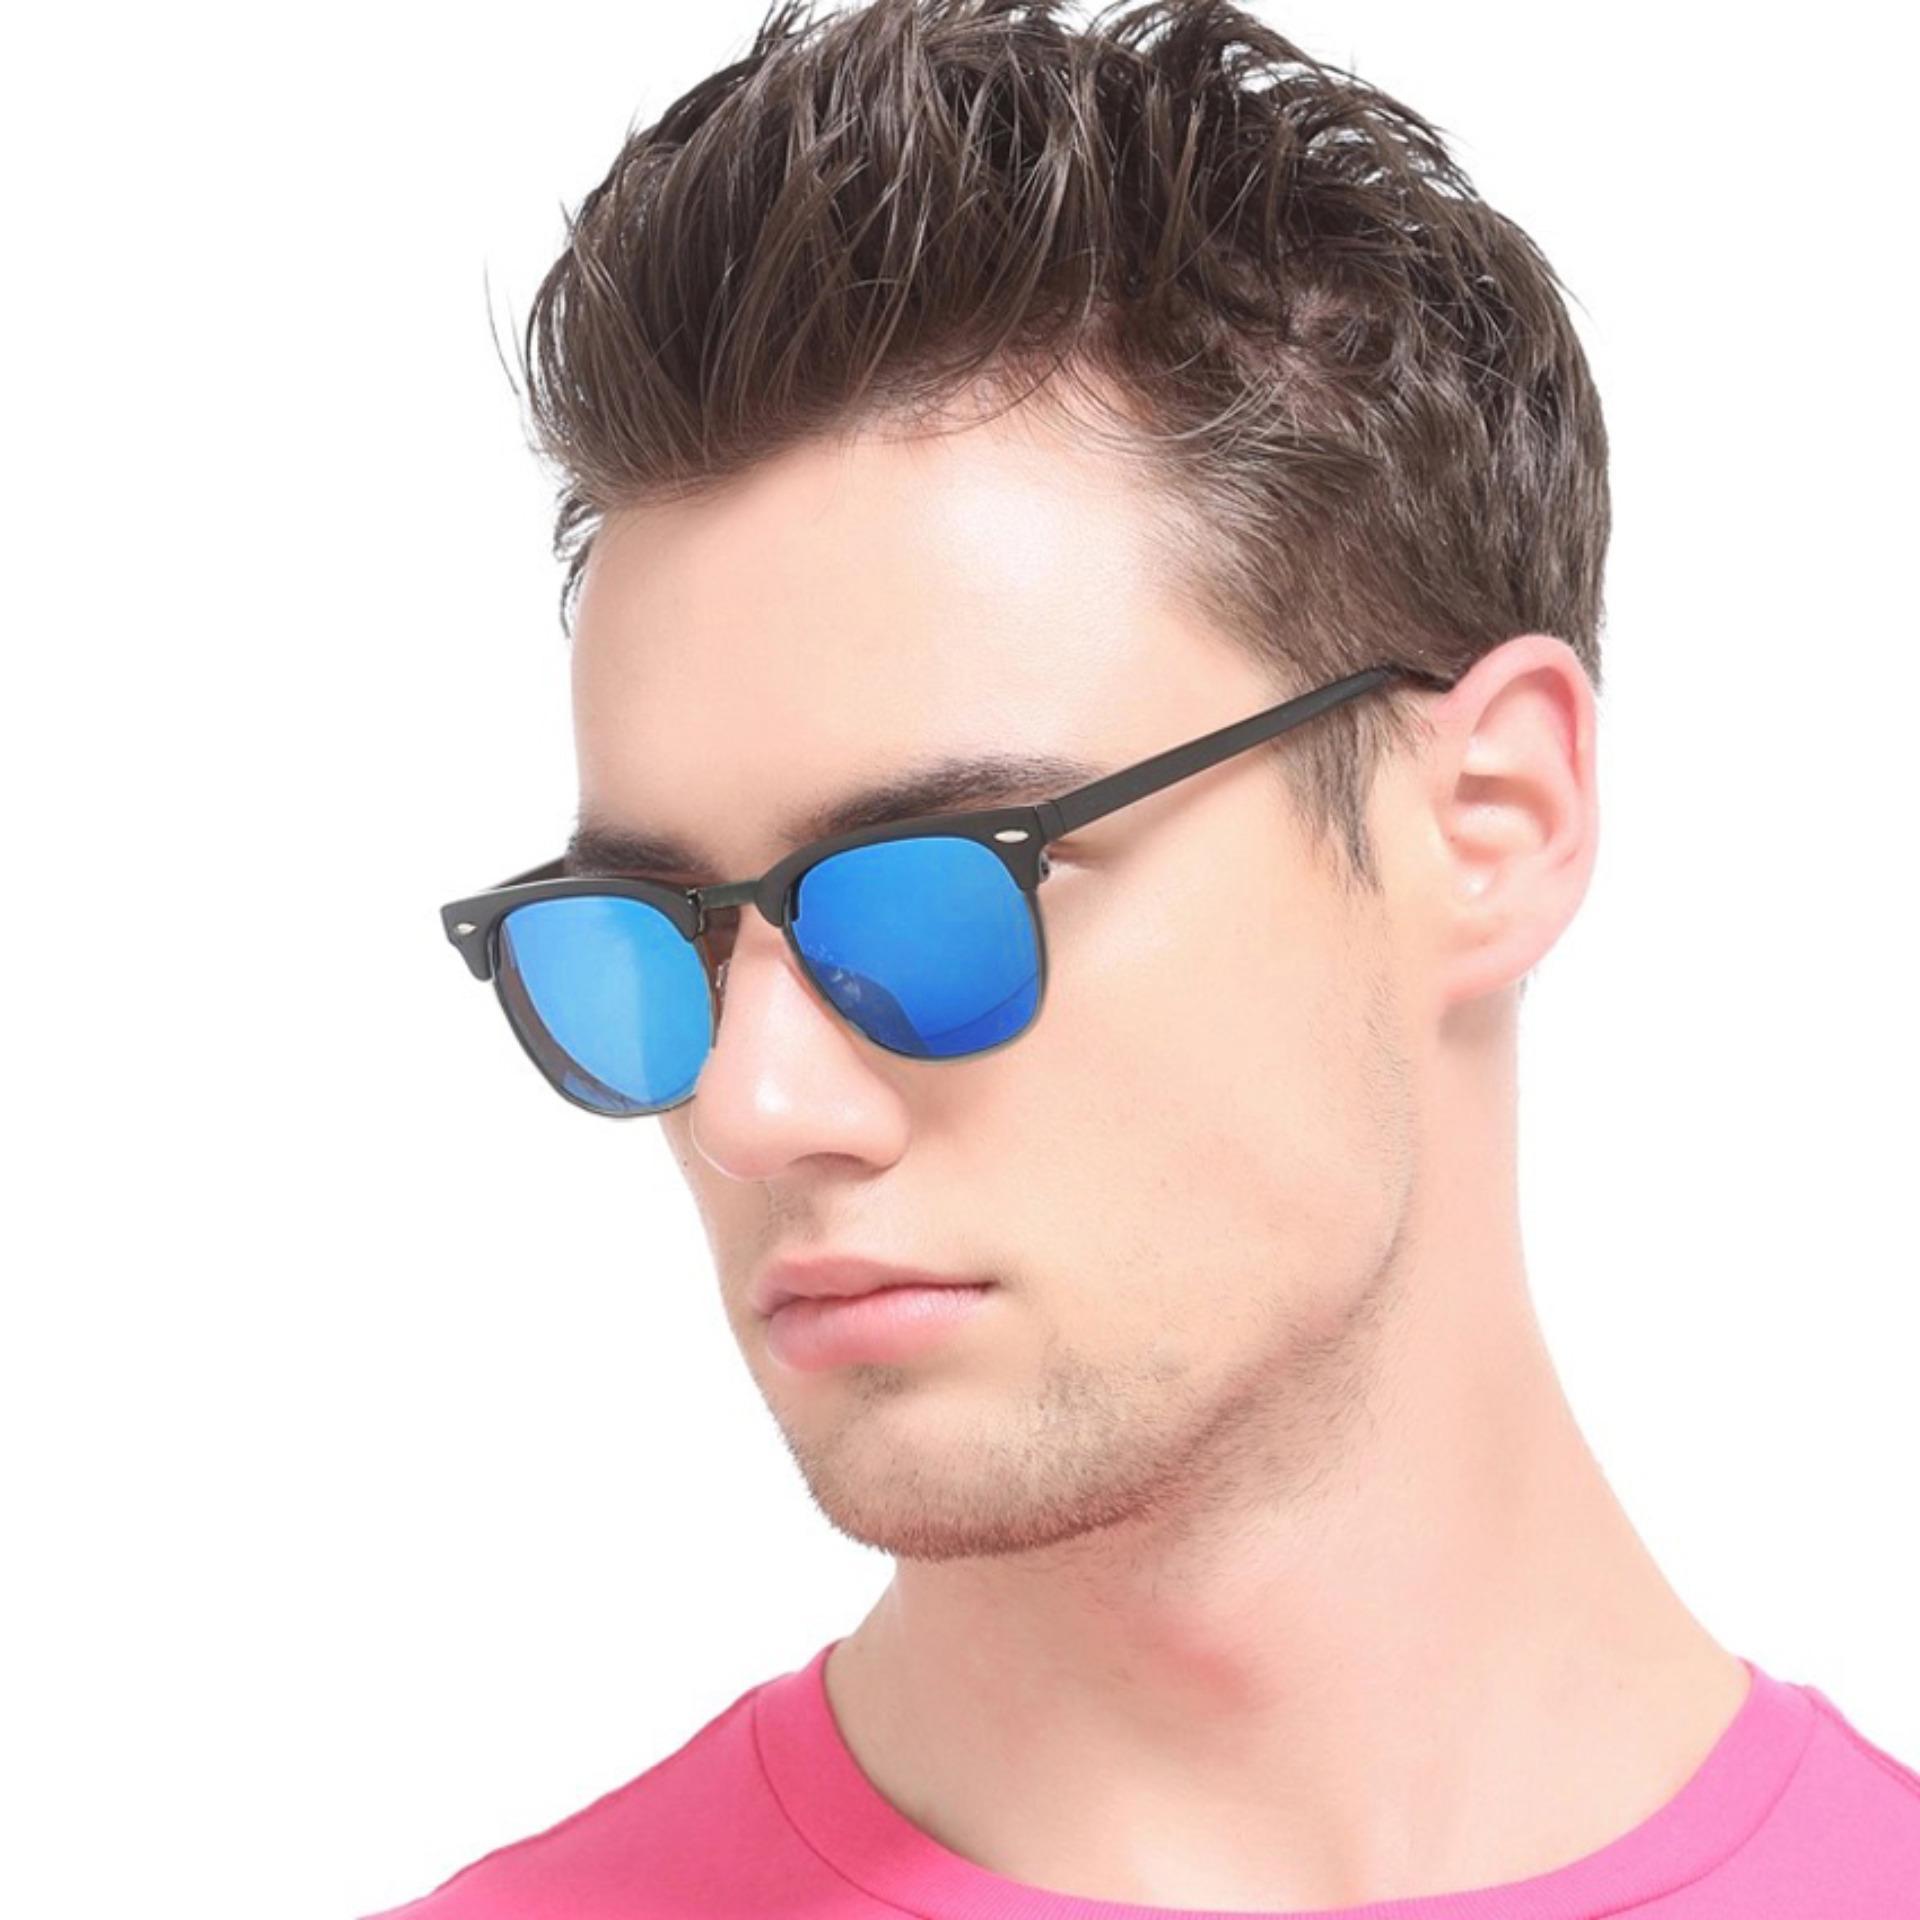 Unisex Retro Club Master Sunglasses - HLL 254 Blue Mirror